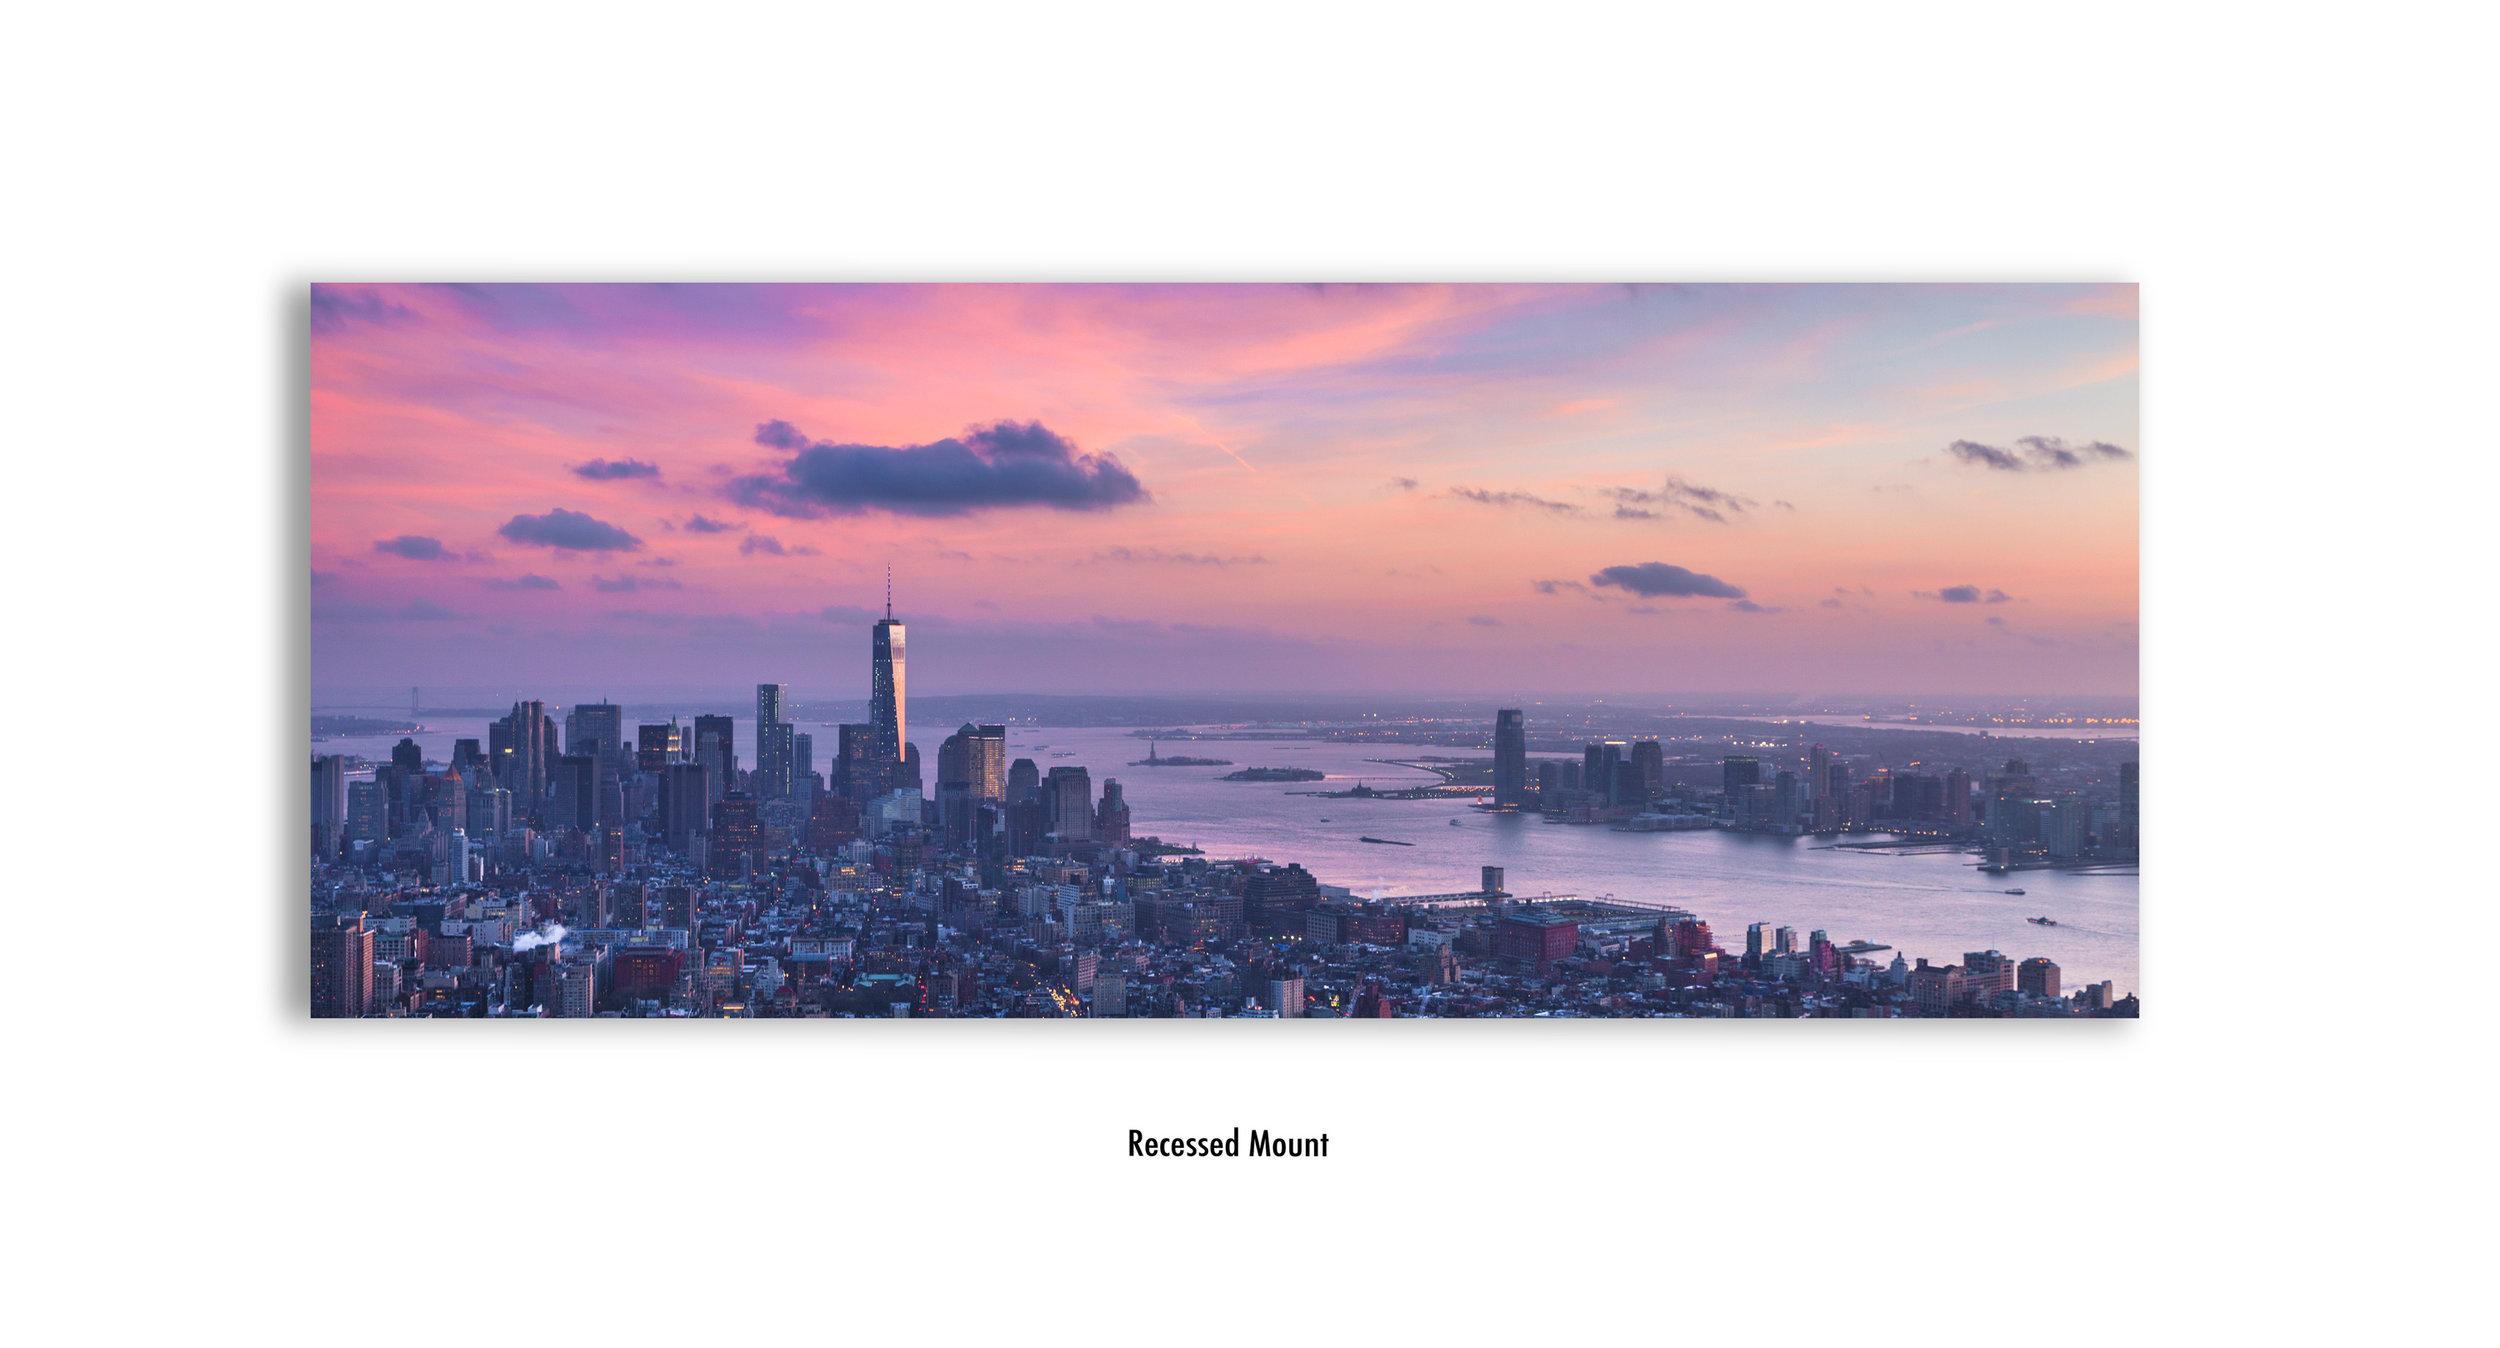 NY-Pano-recessed-mount.jpg